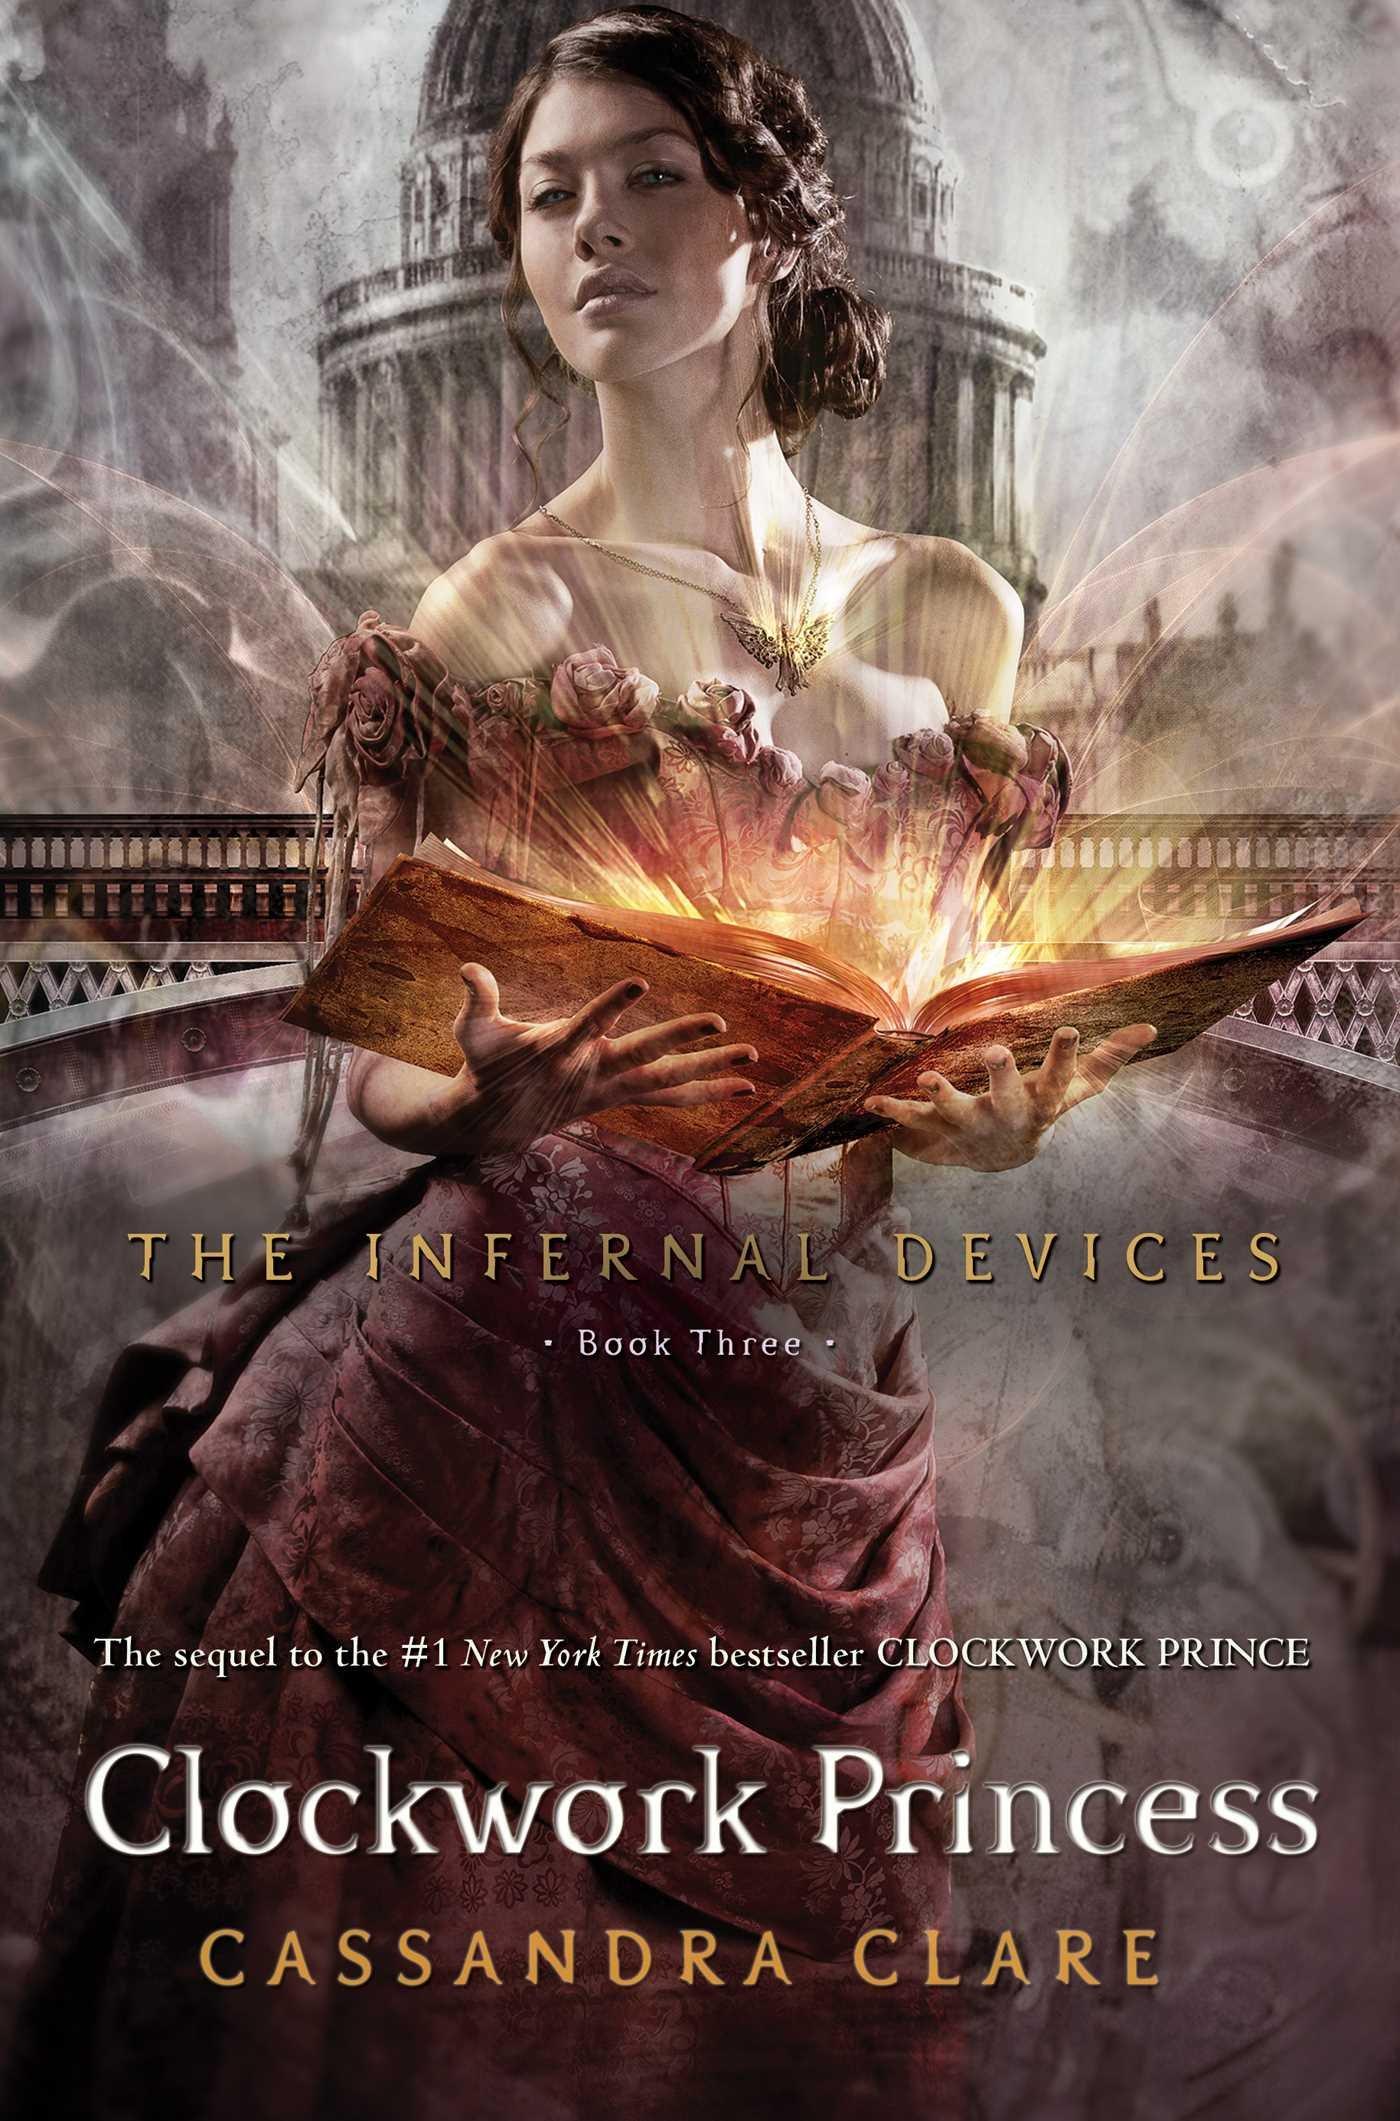 Amazon.fr - Clockwork Princess. - Clare, Cassandra - Livres